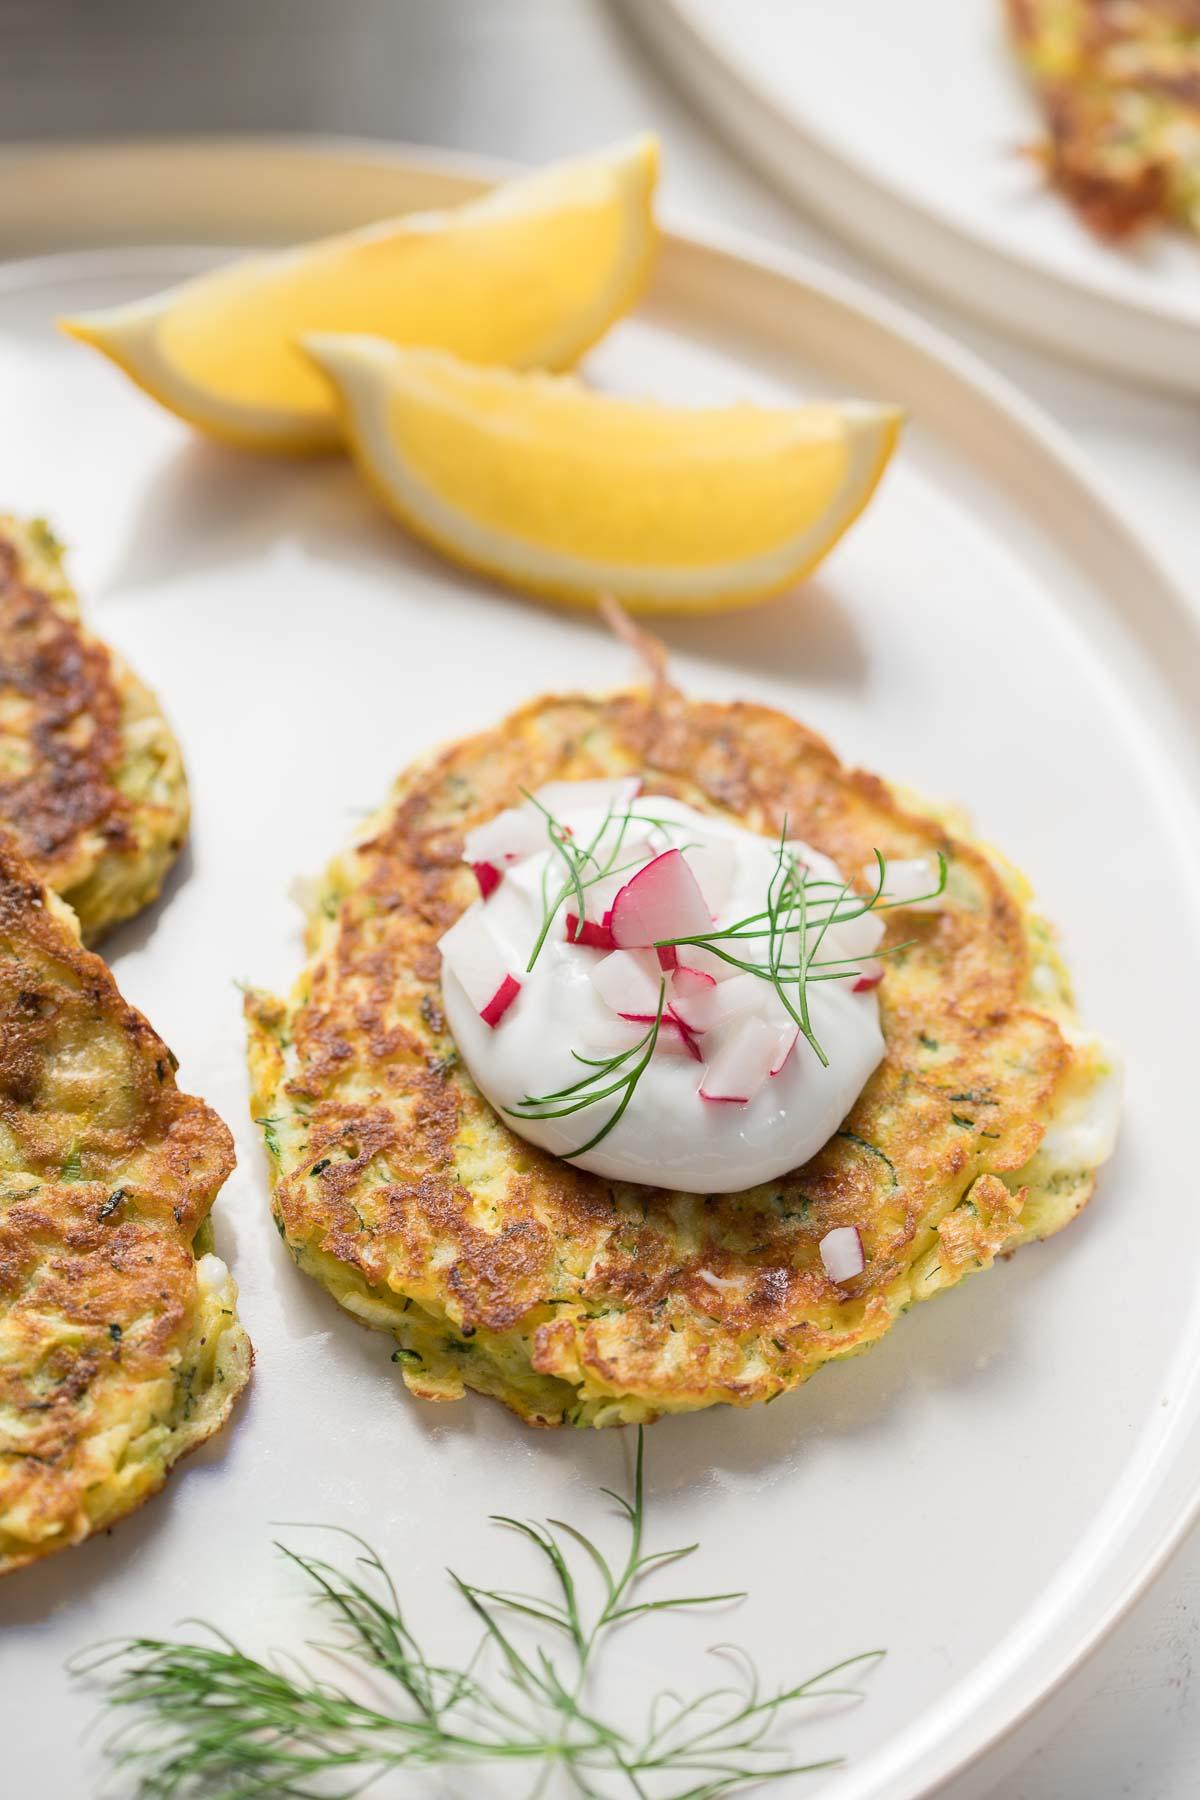 Zucchini-Pancakes with Feta and Dill, plus yoghurt sauce, gluten-free recipe